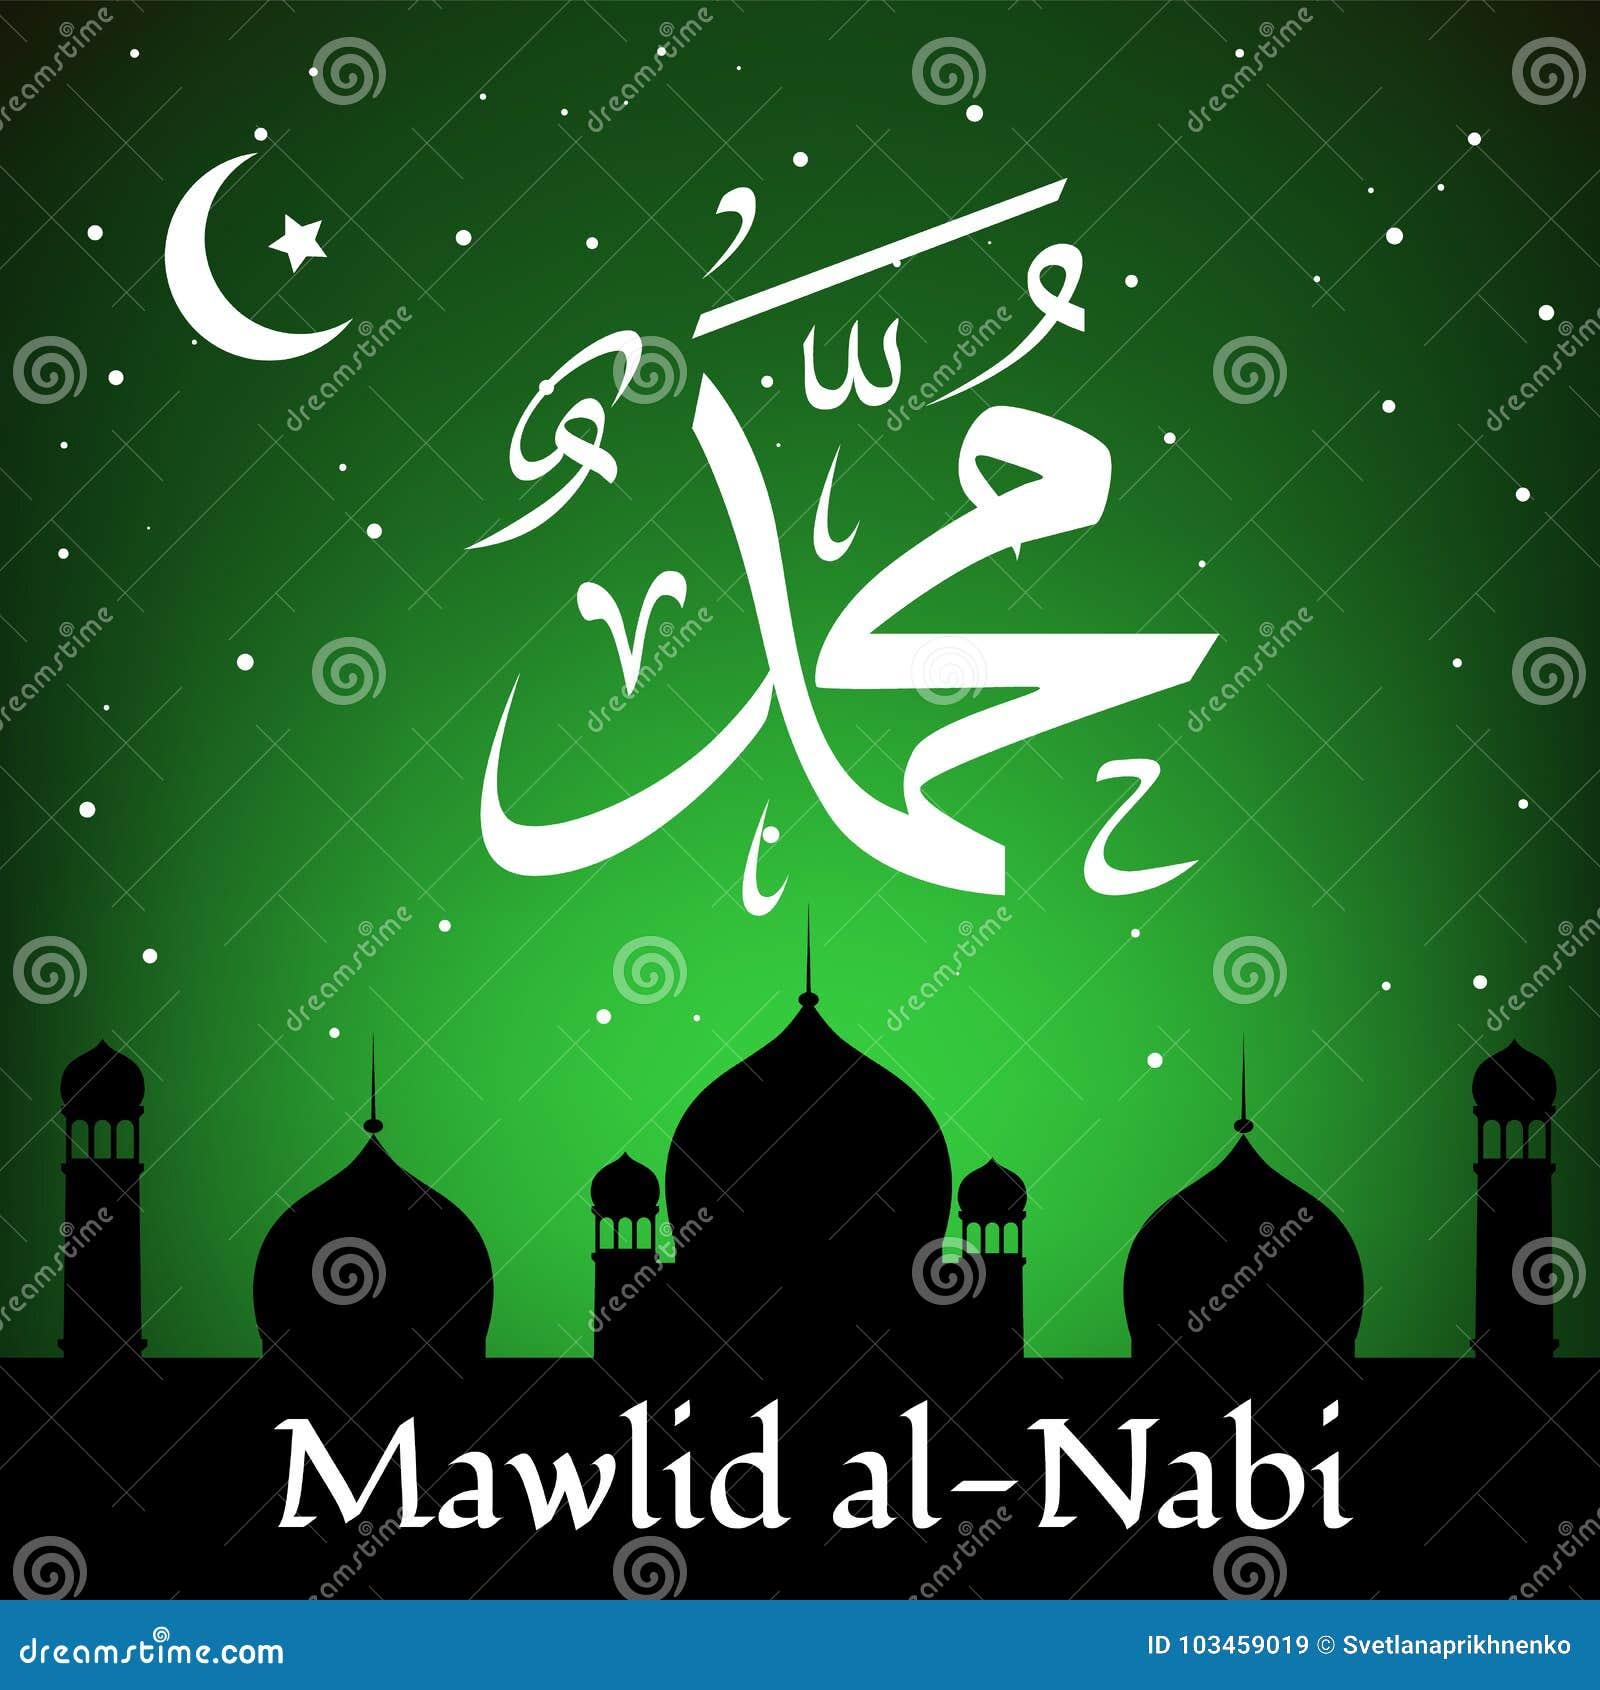 Mawlid al nabi stock vector illustration of arabic 103459019 translation prophet muhammads birthday greeting card for islamic holiday m4hsunfo